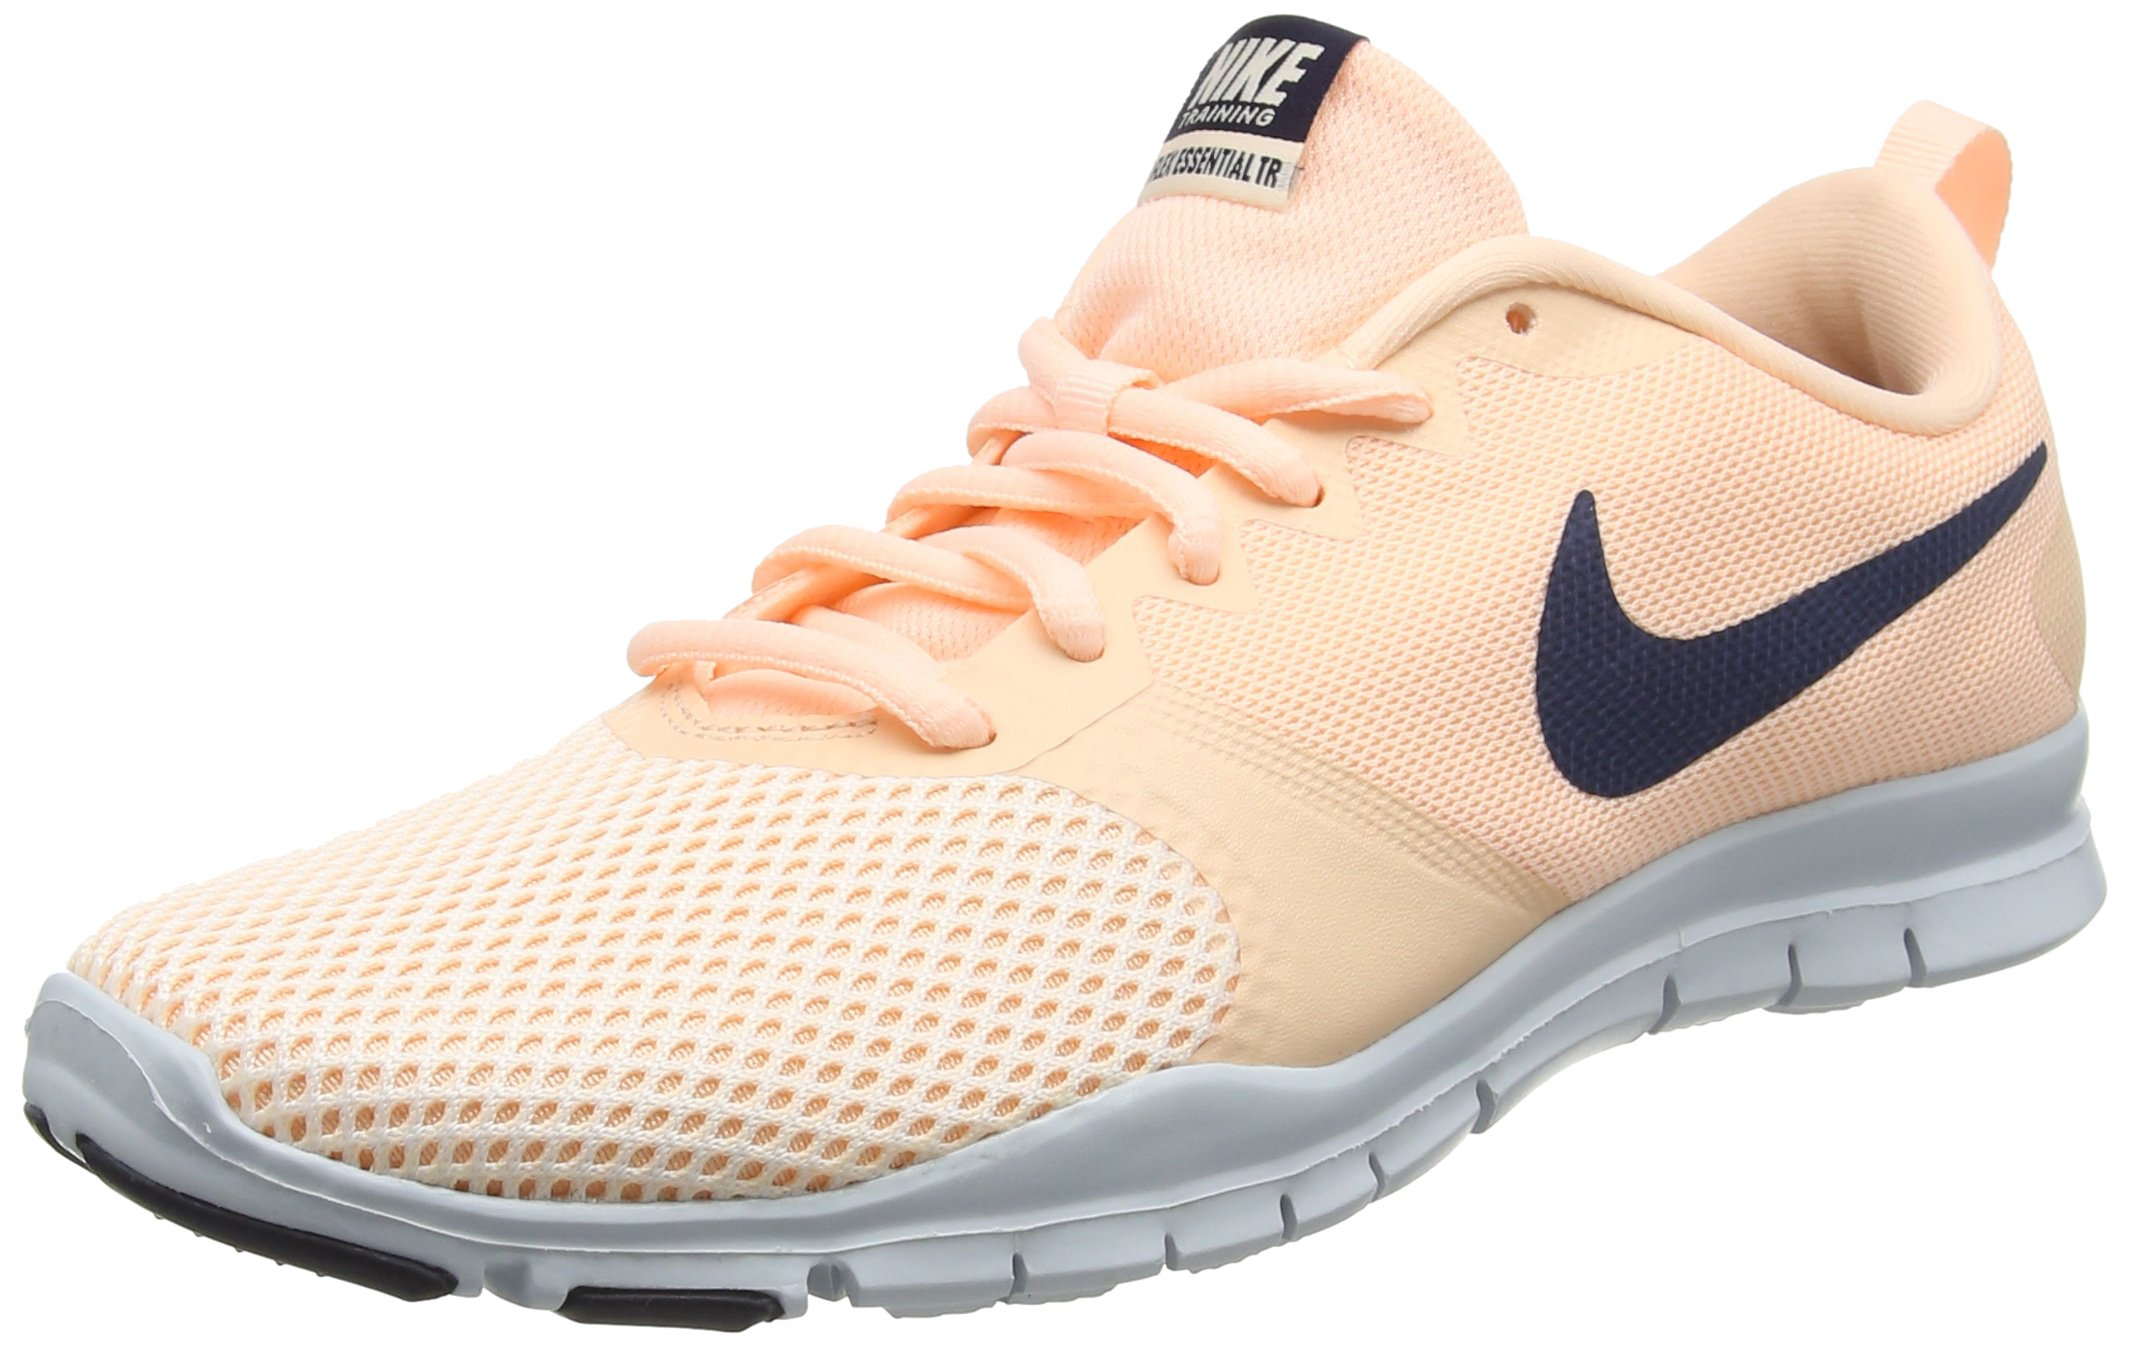 224825f785 Galleon - Nike Women's Flex Essential Training Shoe (8.5, Crimson  Tint/Obsidian-Pure Platinum)